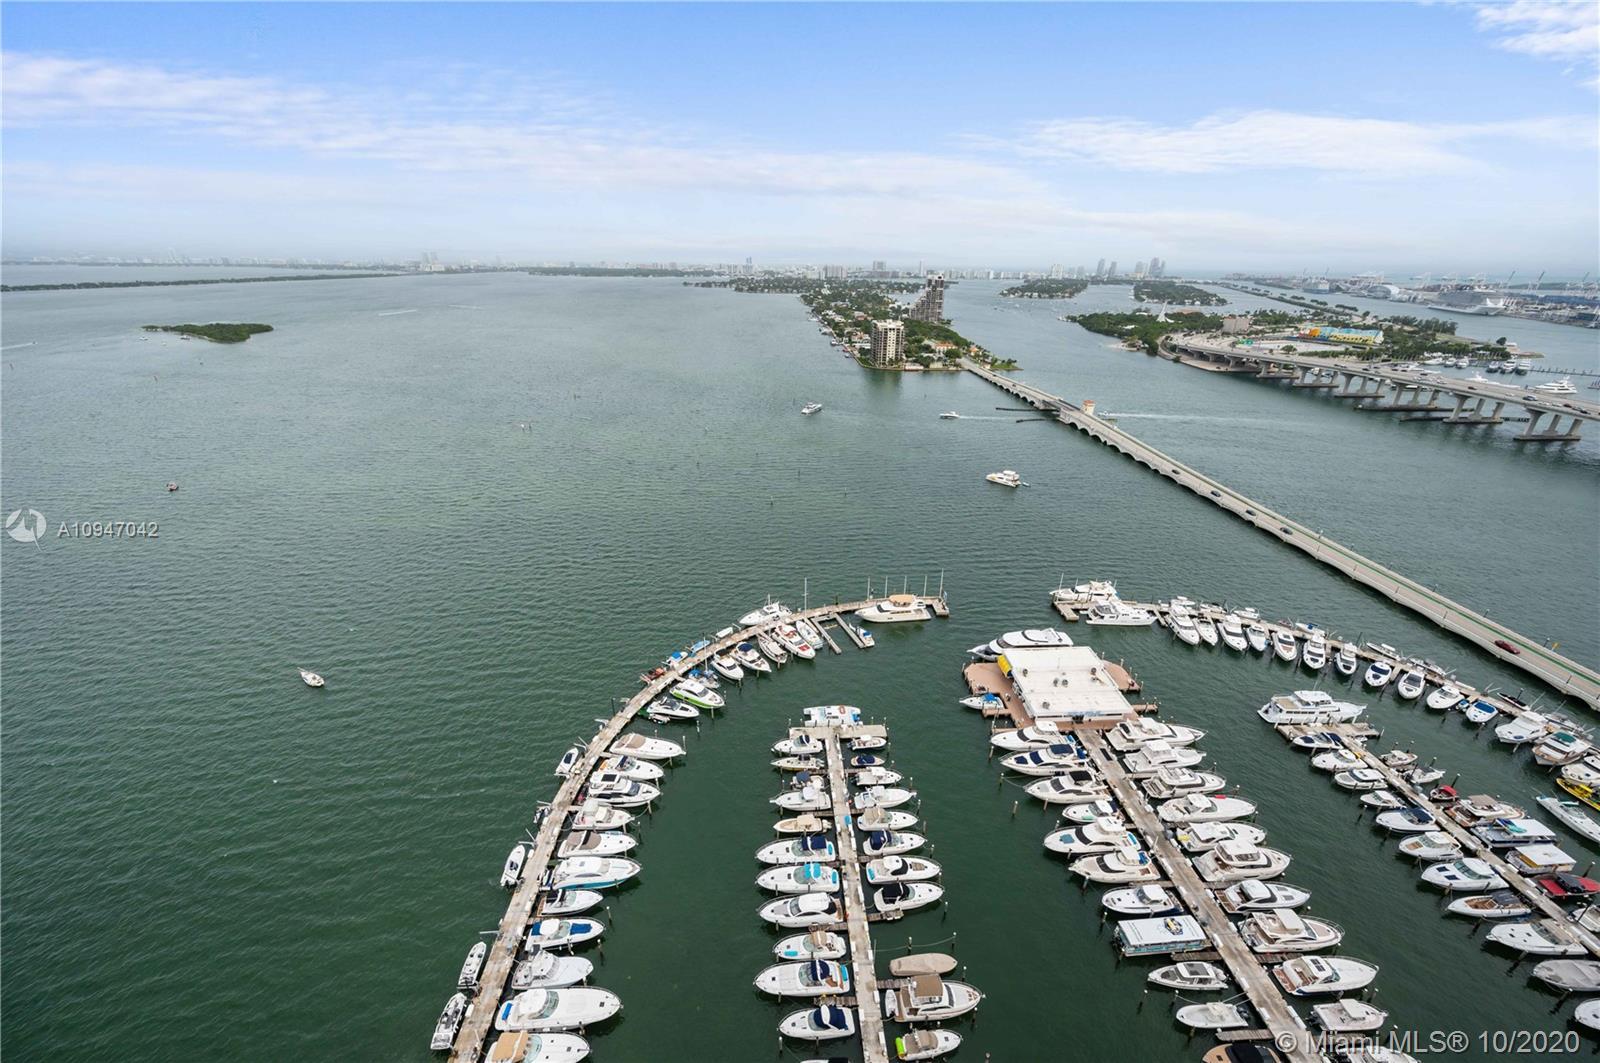 1717 N Bayshore Dr # 3831, Miami, Florida 33132, 2 Bedrooms Bedrooms, ,2 BathroomsBathrooms,Residential,For Sale,1717 N Bayshore Dr # 3831,A10947042